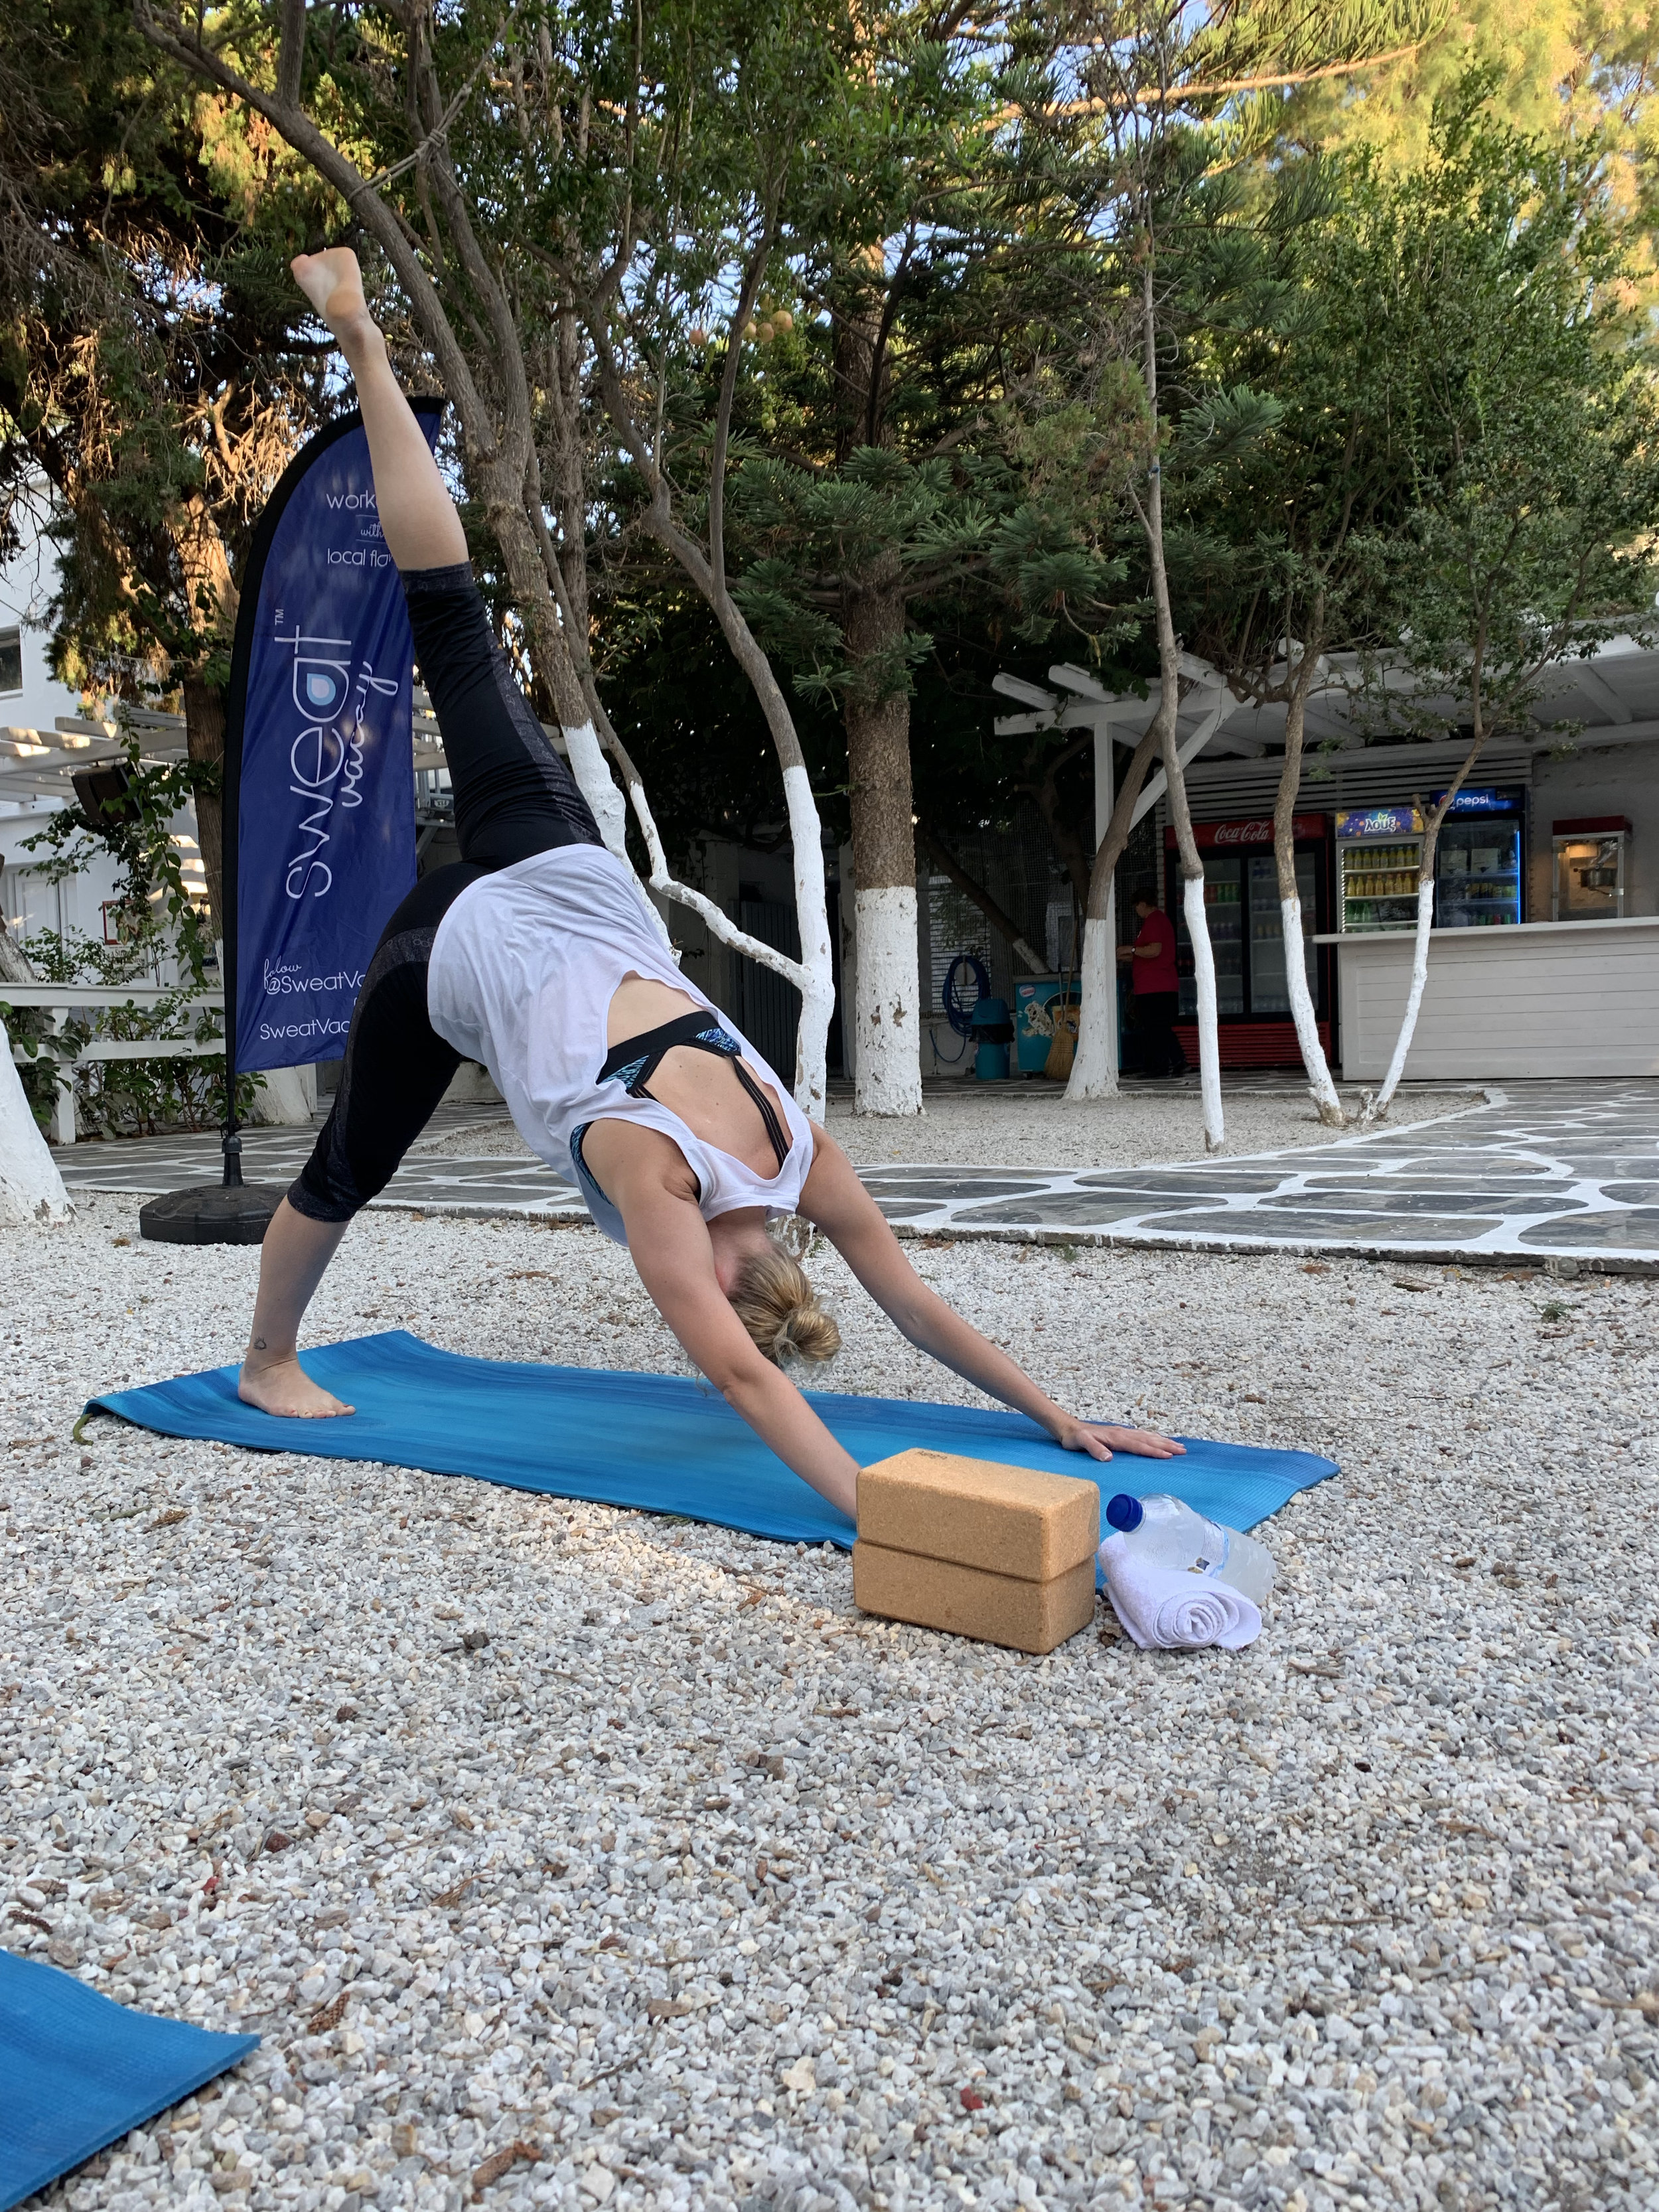 CM yoga Aug 26 b.jpg